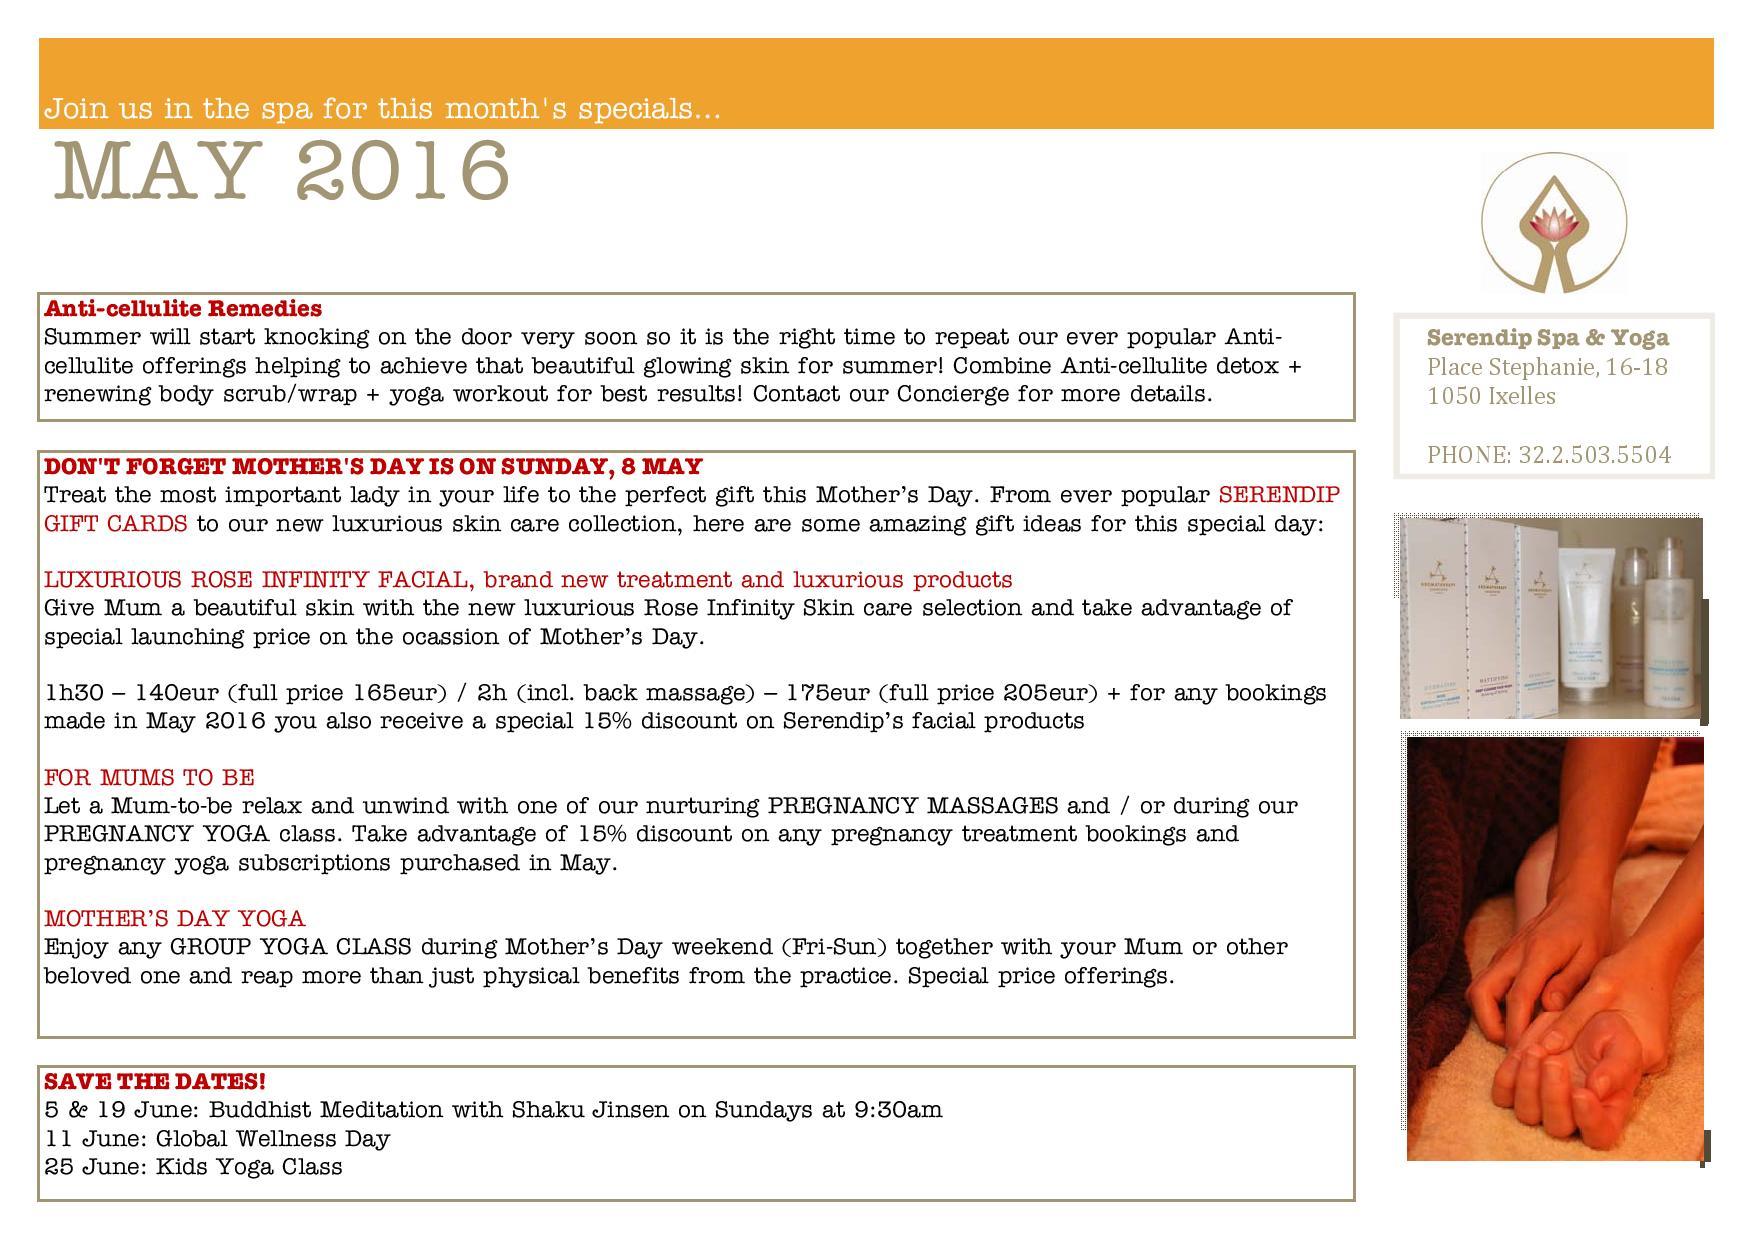 Serendip Spa and Yoga Calendar 2016_BACK A4-page-001.jpg